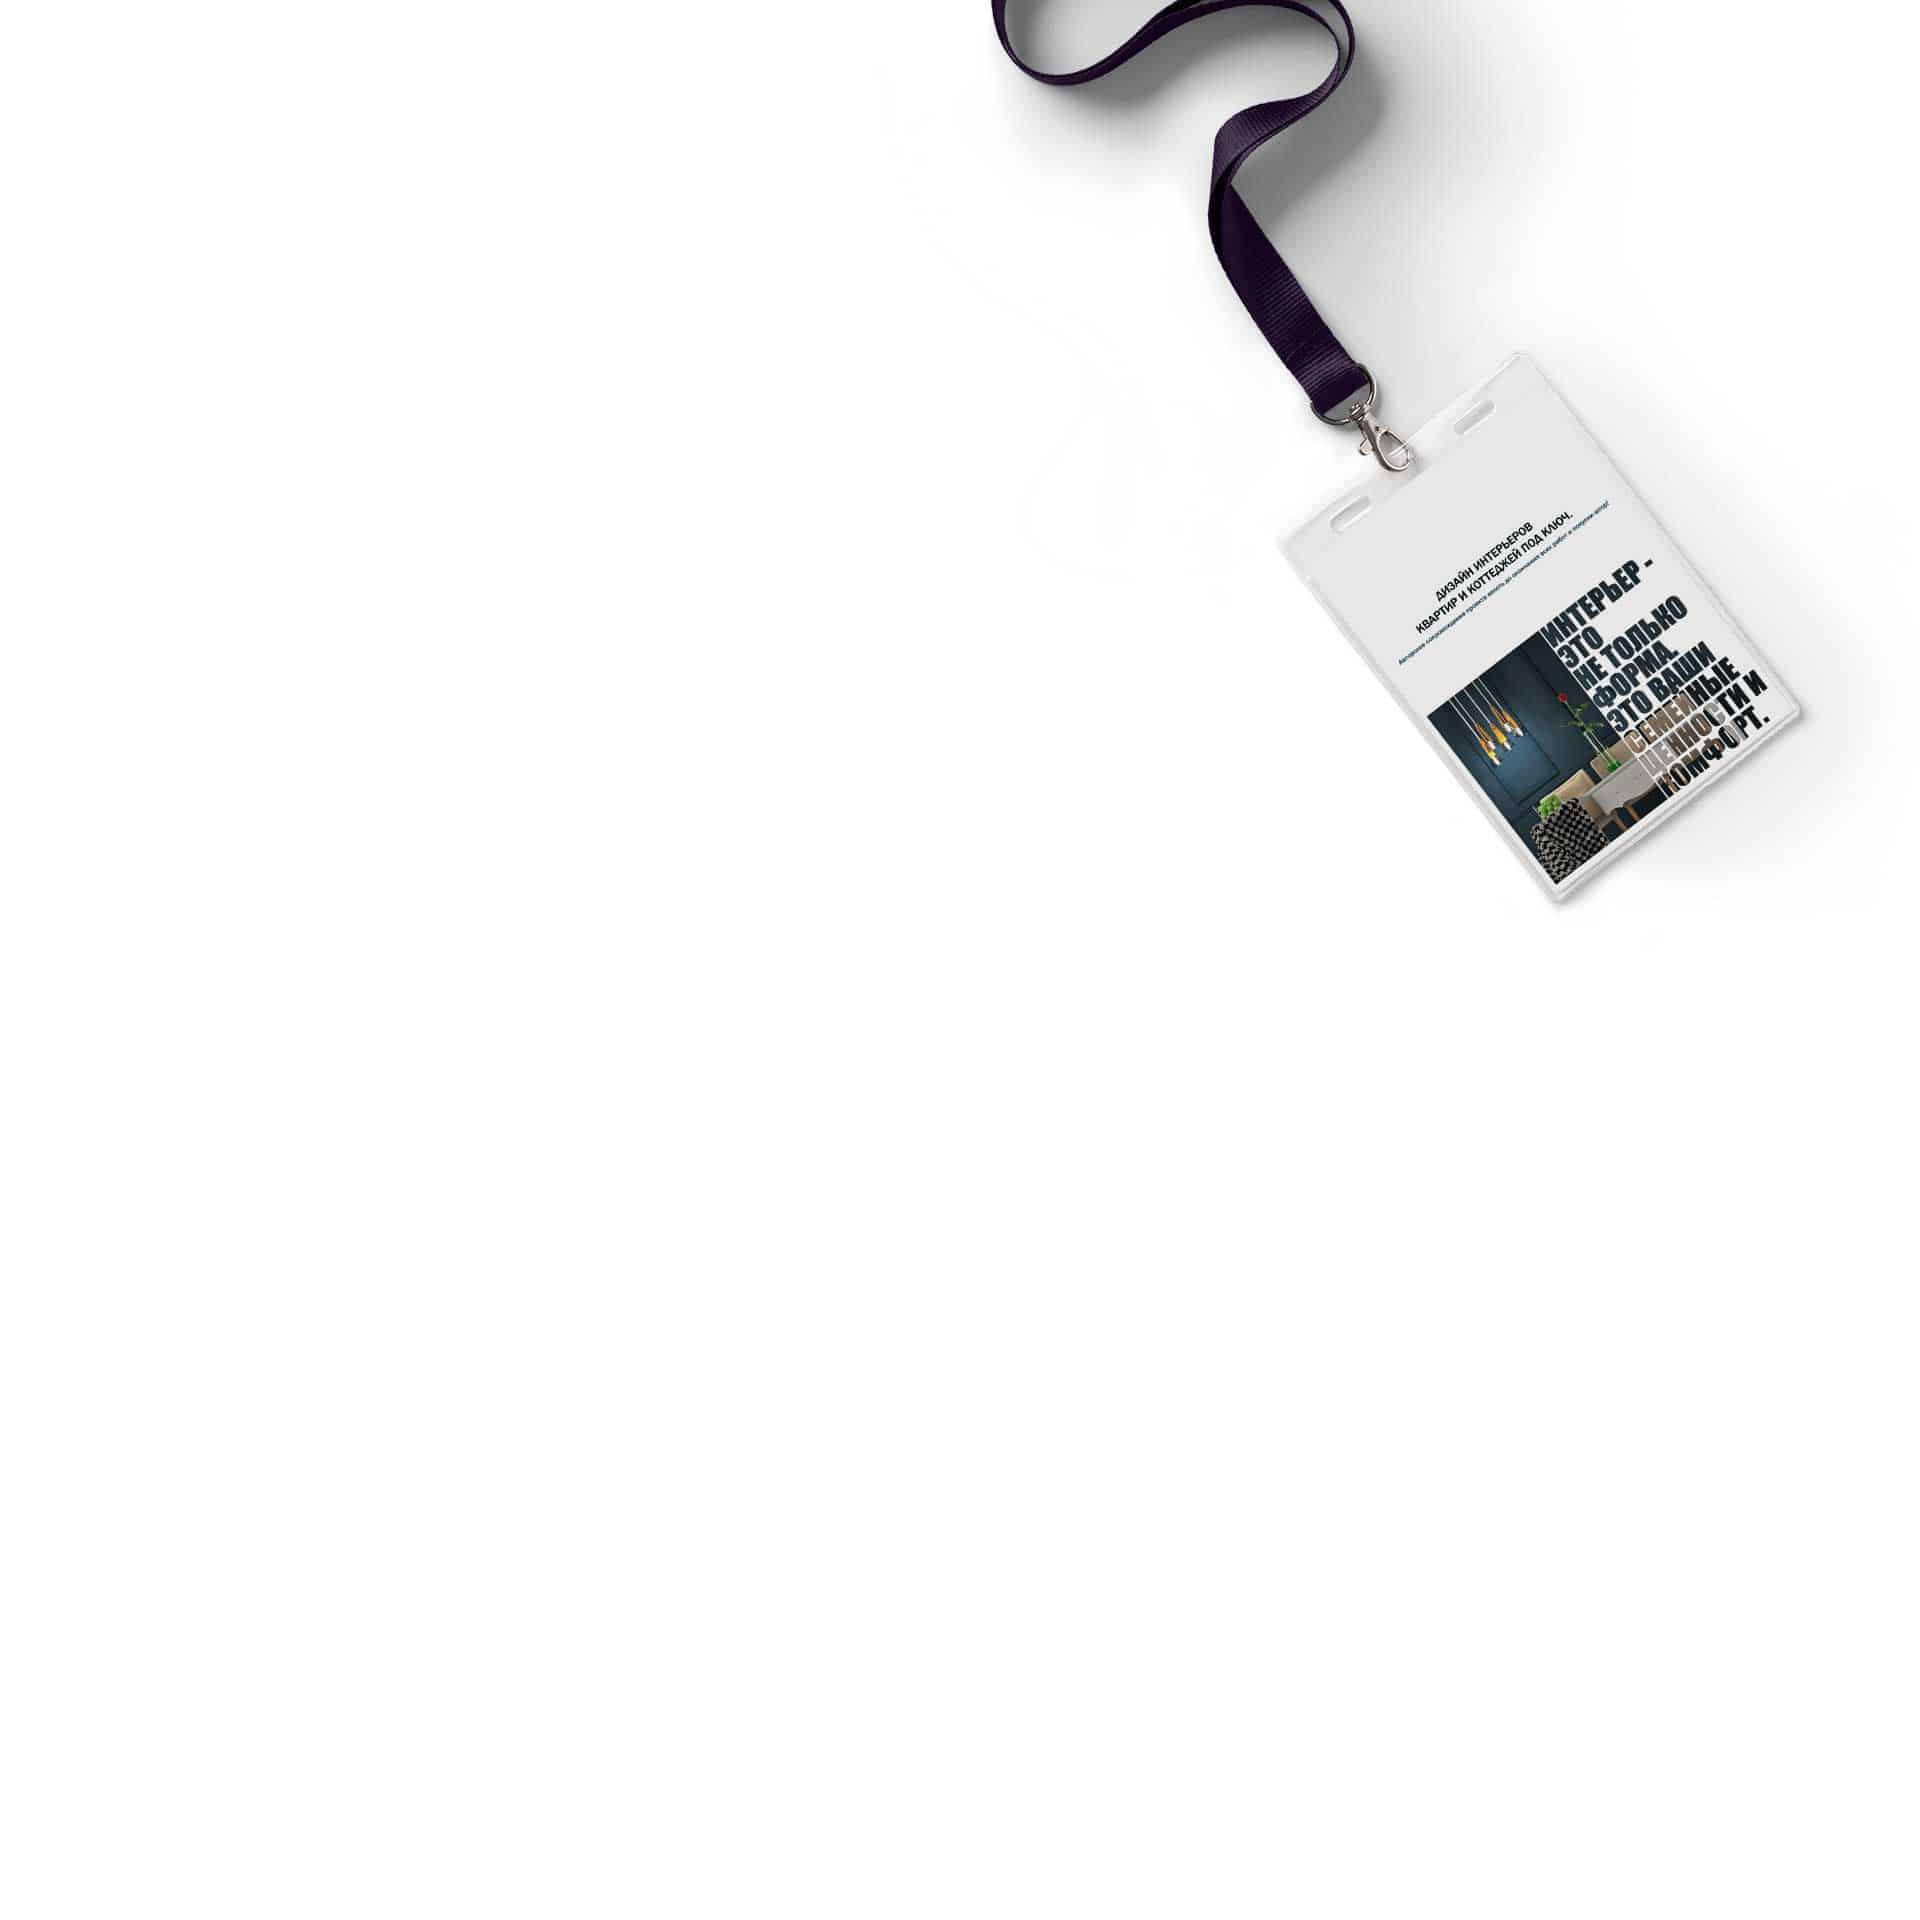 ID-Card-Holder-Mockup-vol-2